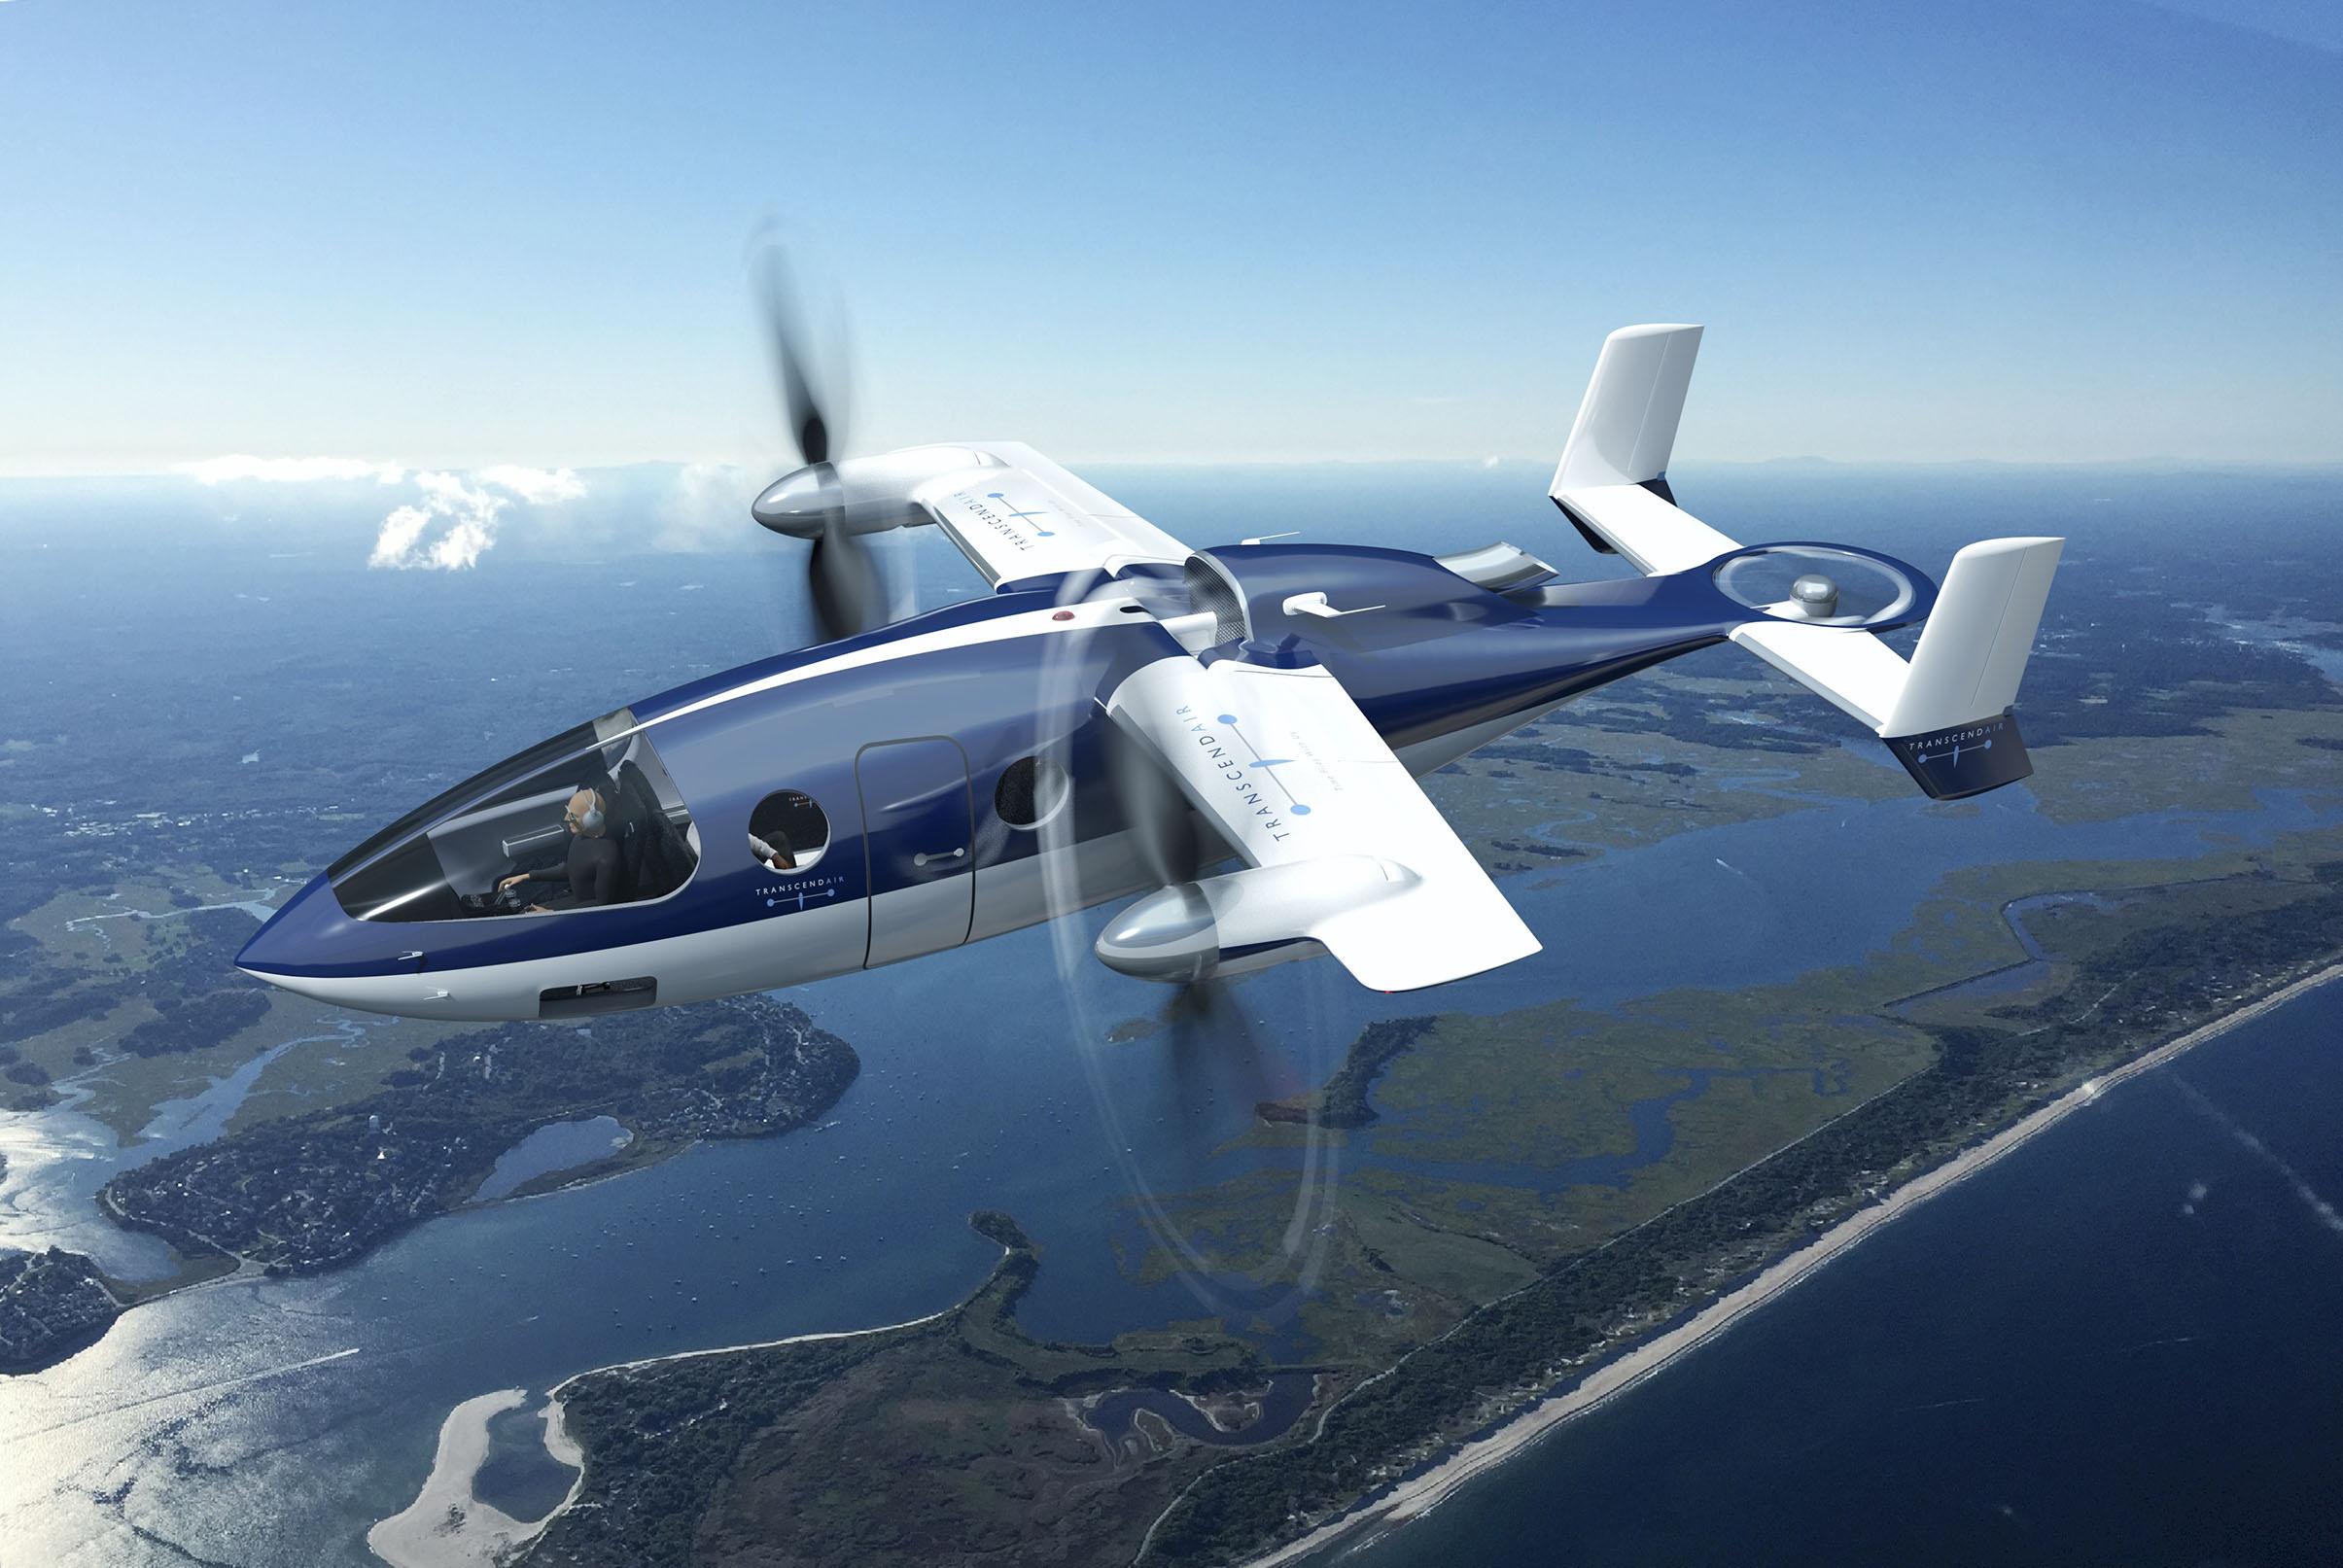 Transcend chooses Kaman to build Vy 400 VTOL